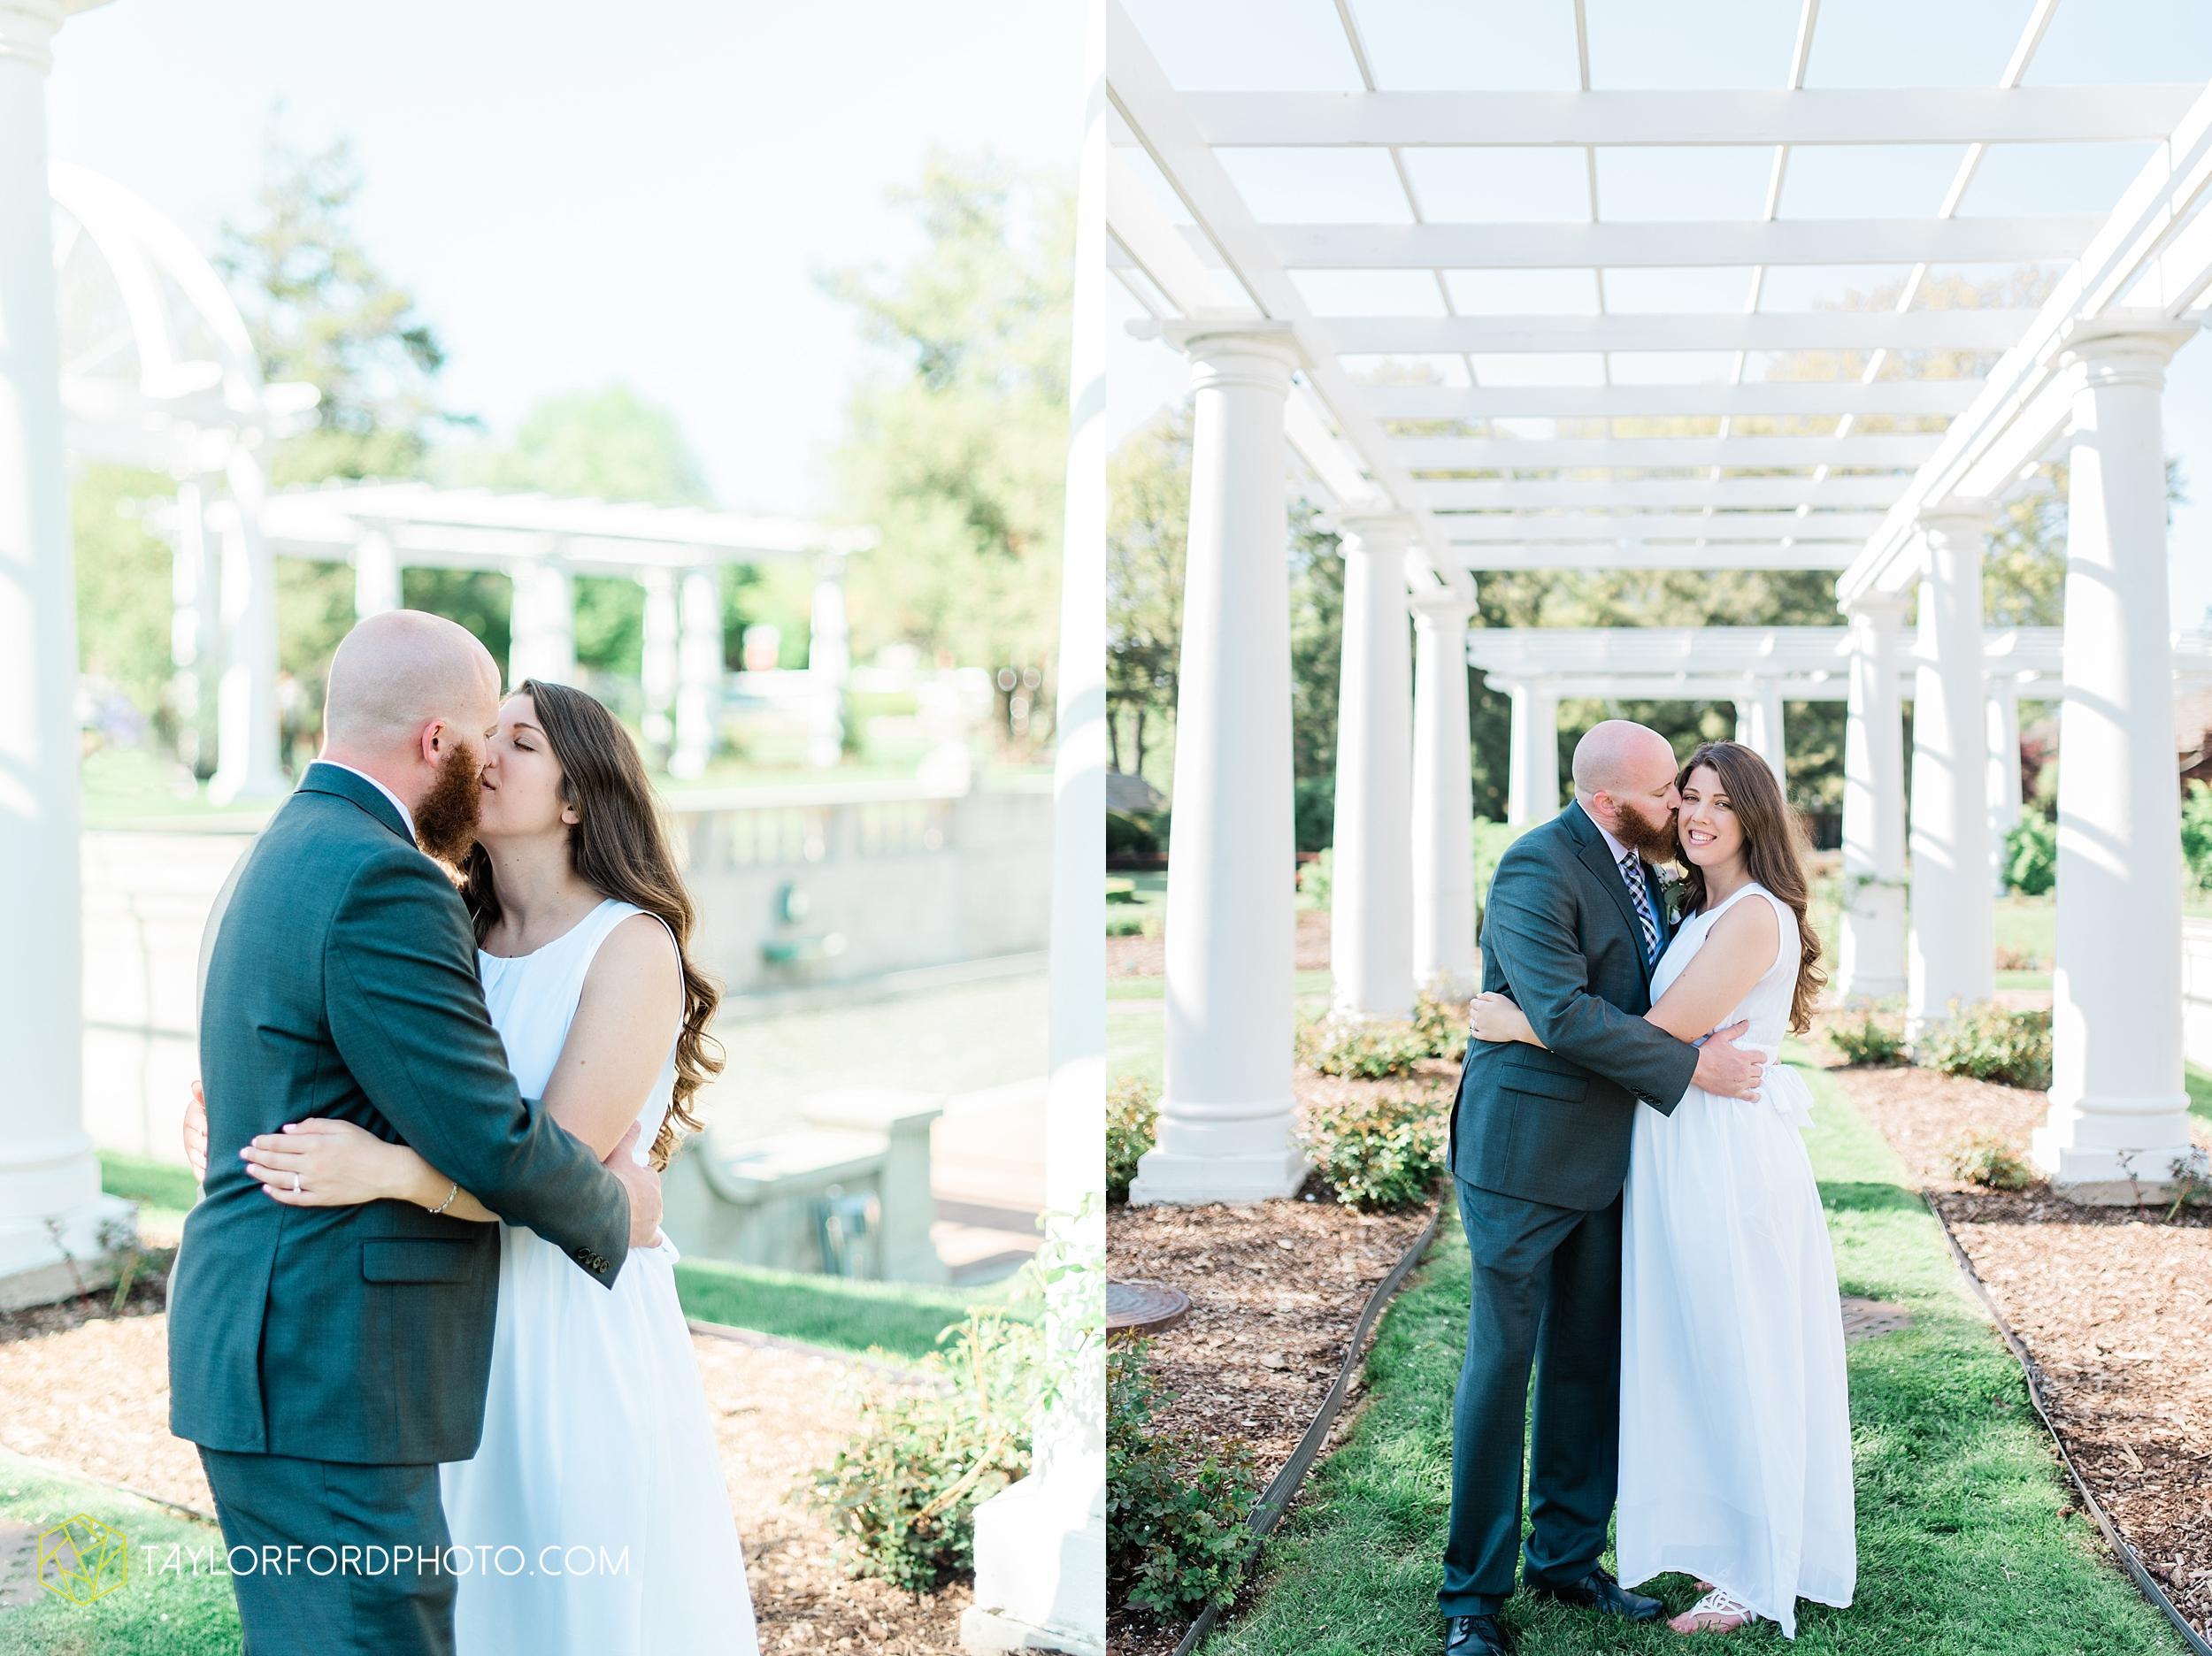 lakeside-rose-gardens-fort-wayne-indiana-elopement-wedding-photographer-Taylor-Ford-Photography_7174.jpg